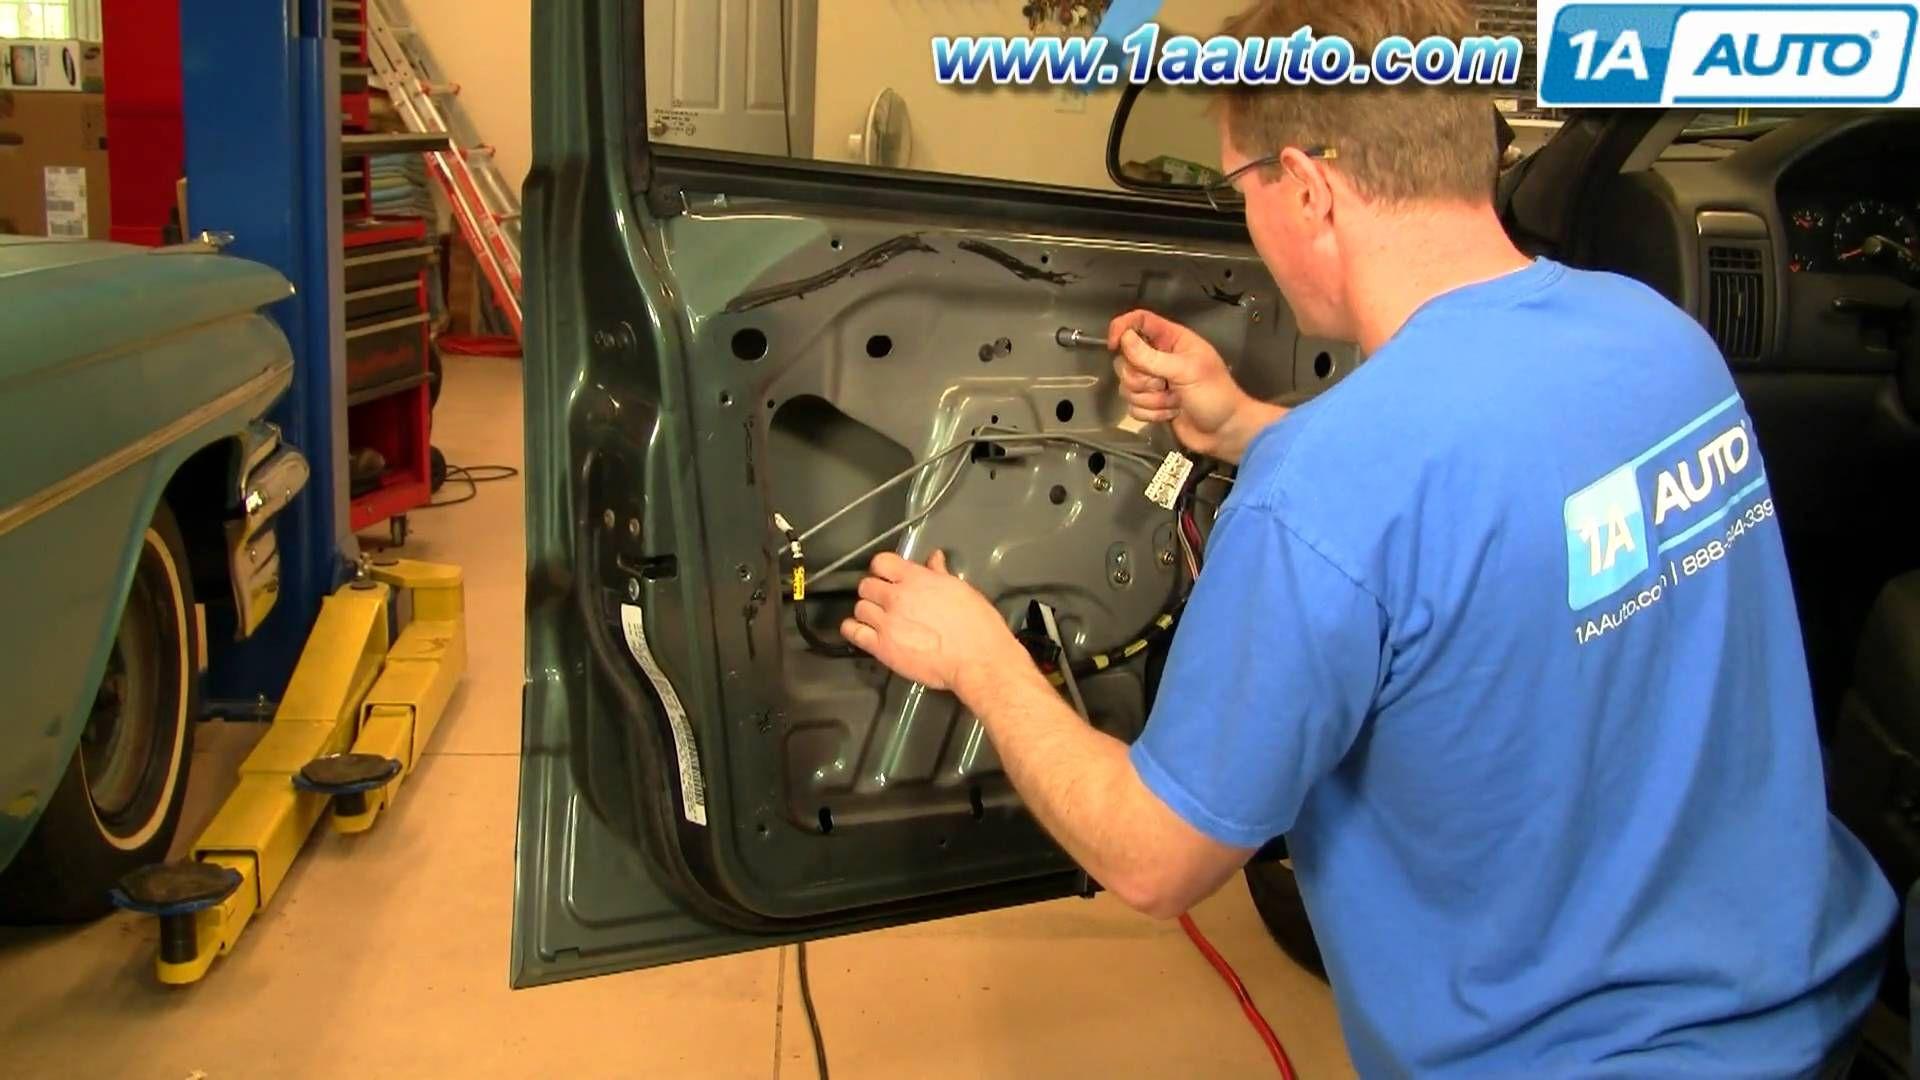 How To Install Replace Window Regulator Jeep Grand Cherokee 99 04 1aau